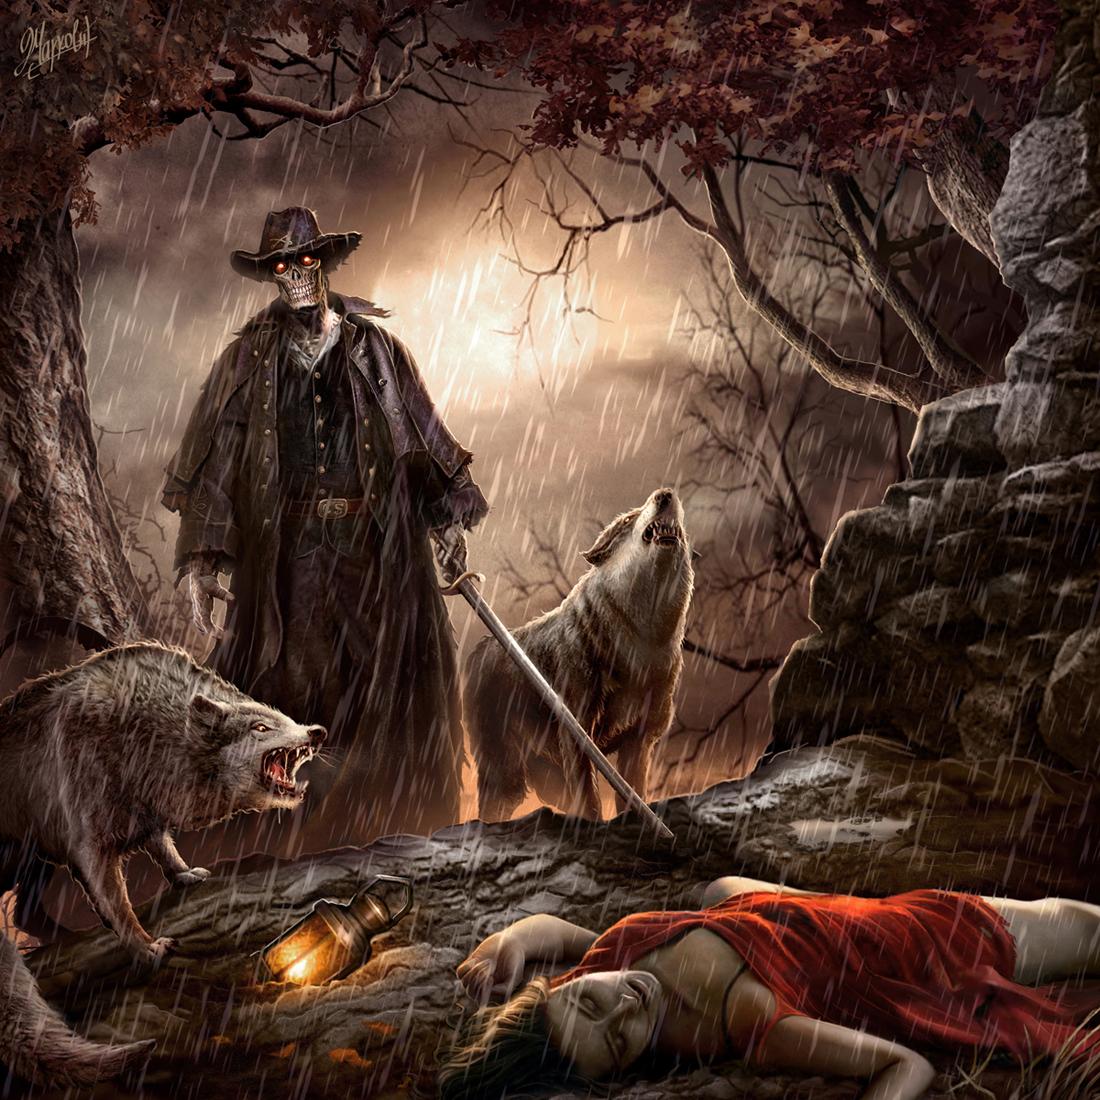 Galeria de Arte: Ficção & Fantasia 1 - Página 5 Devil_s_den_by_dusanmarkovic-d7wv1tp